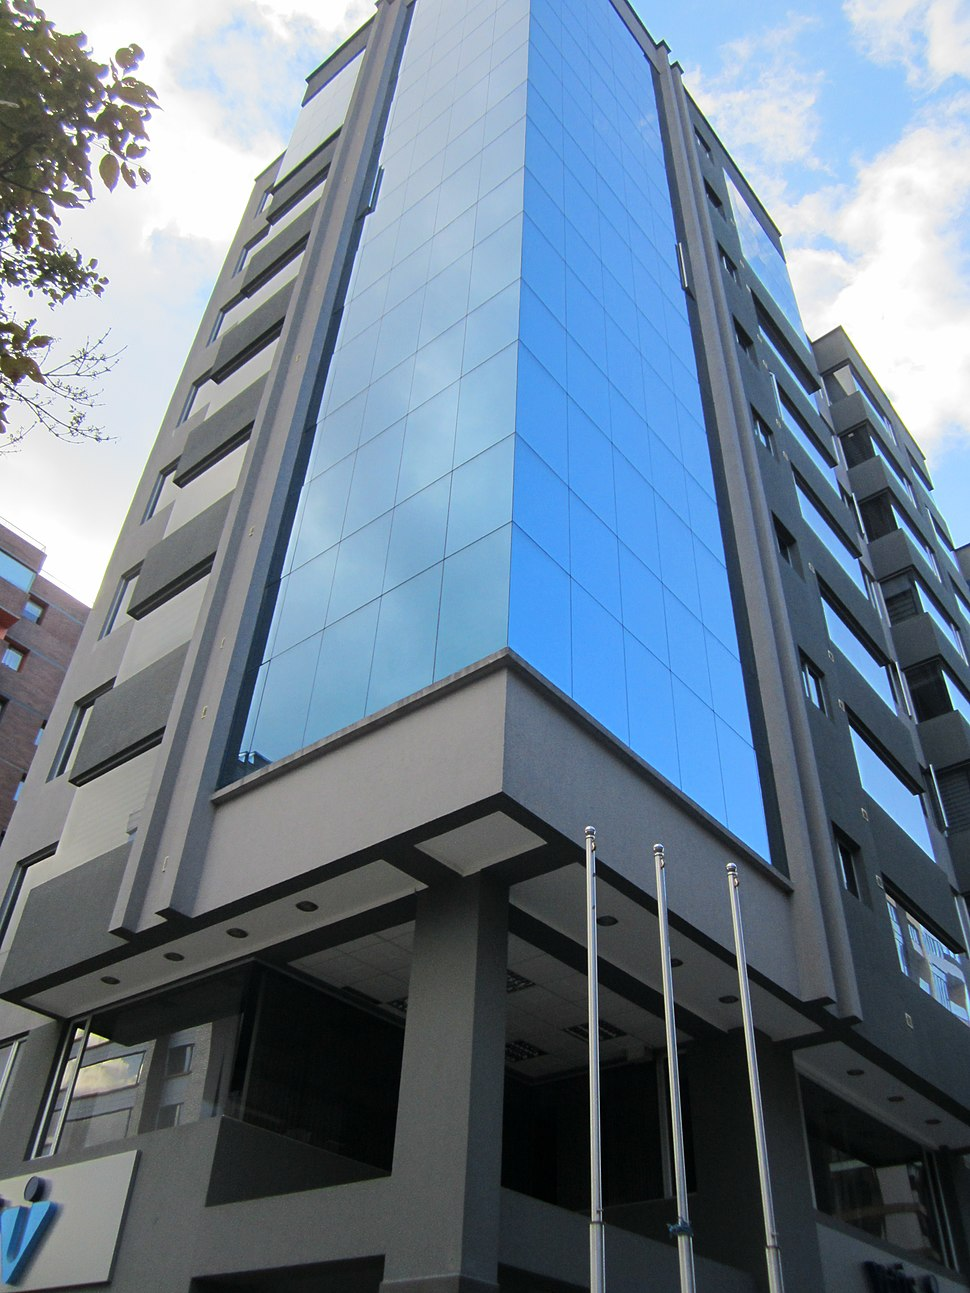 Modern Building in Quito, capital city of Ecuador,